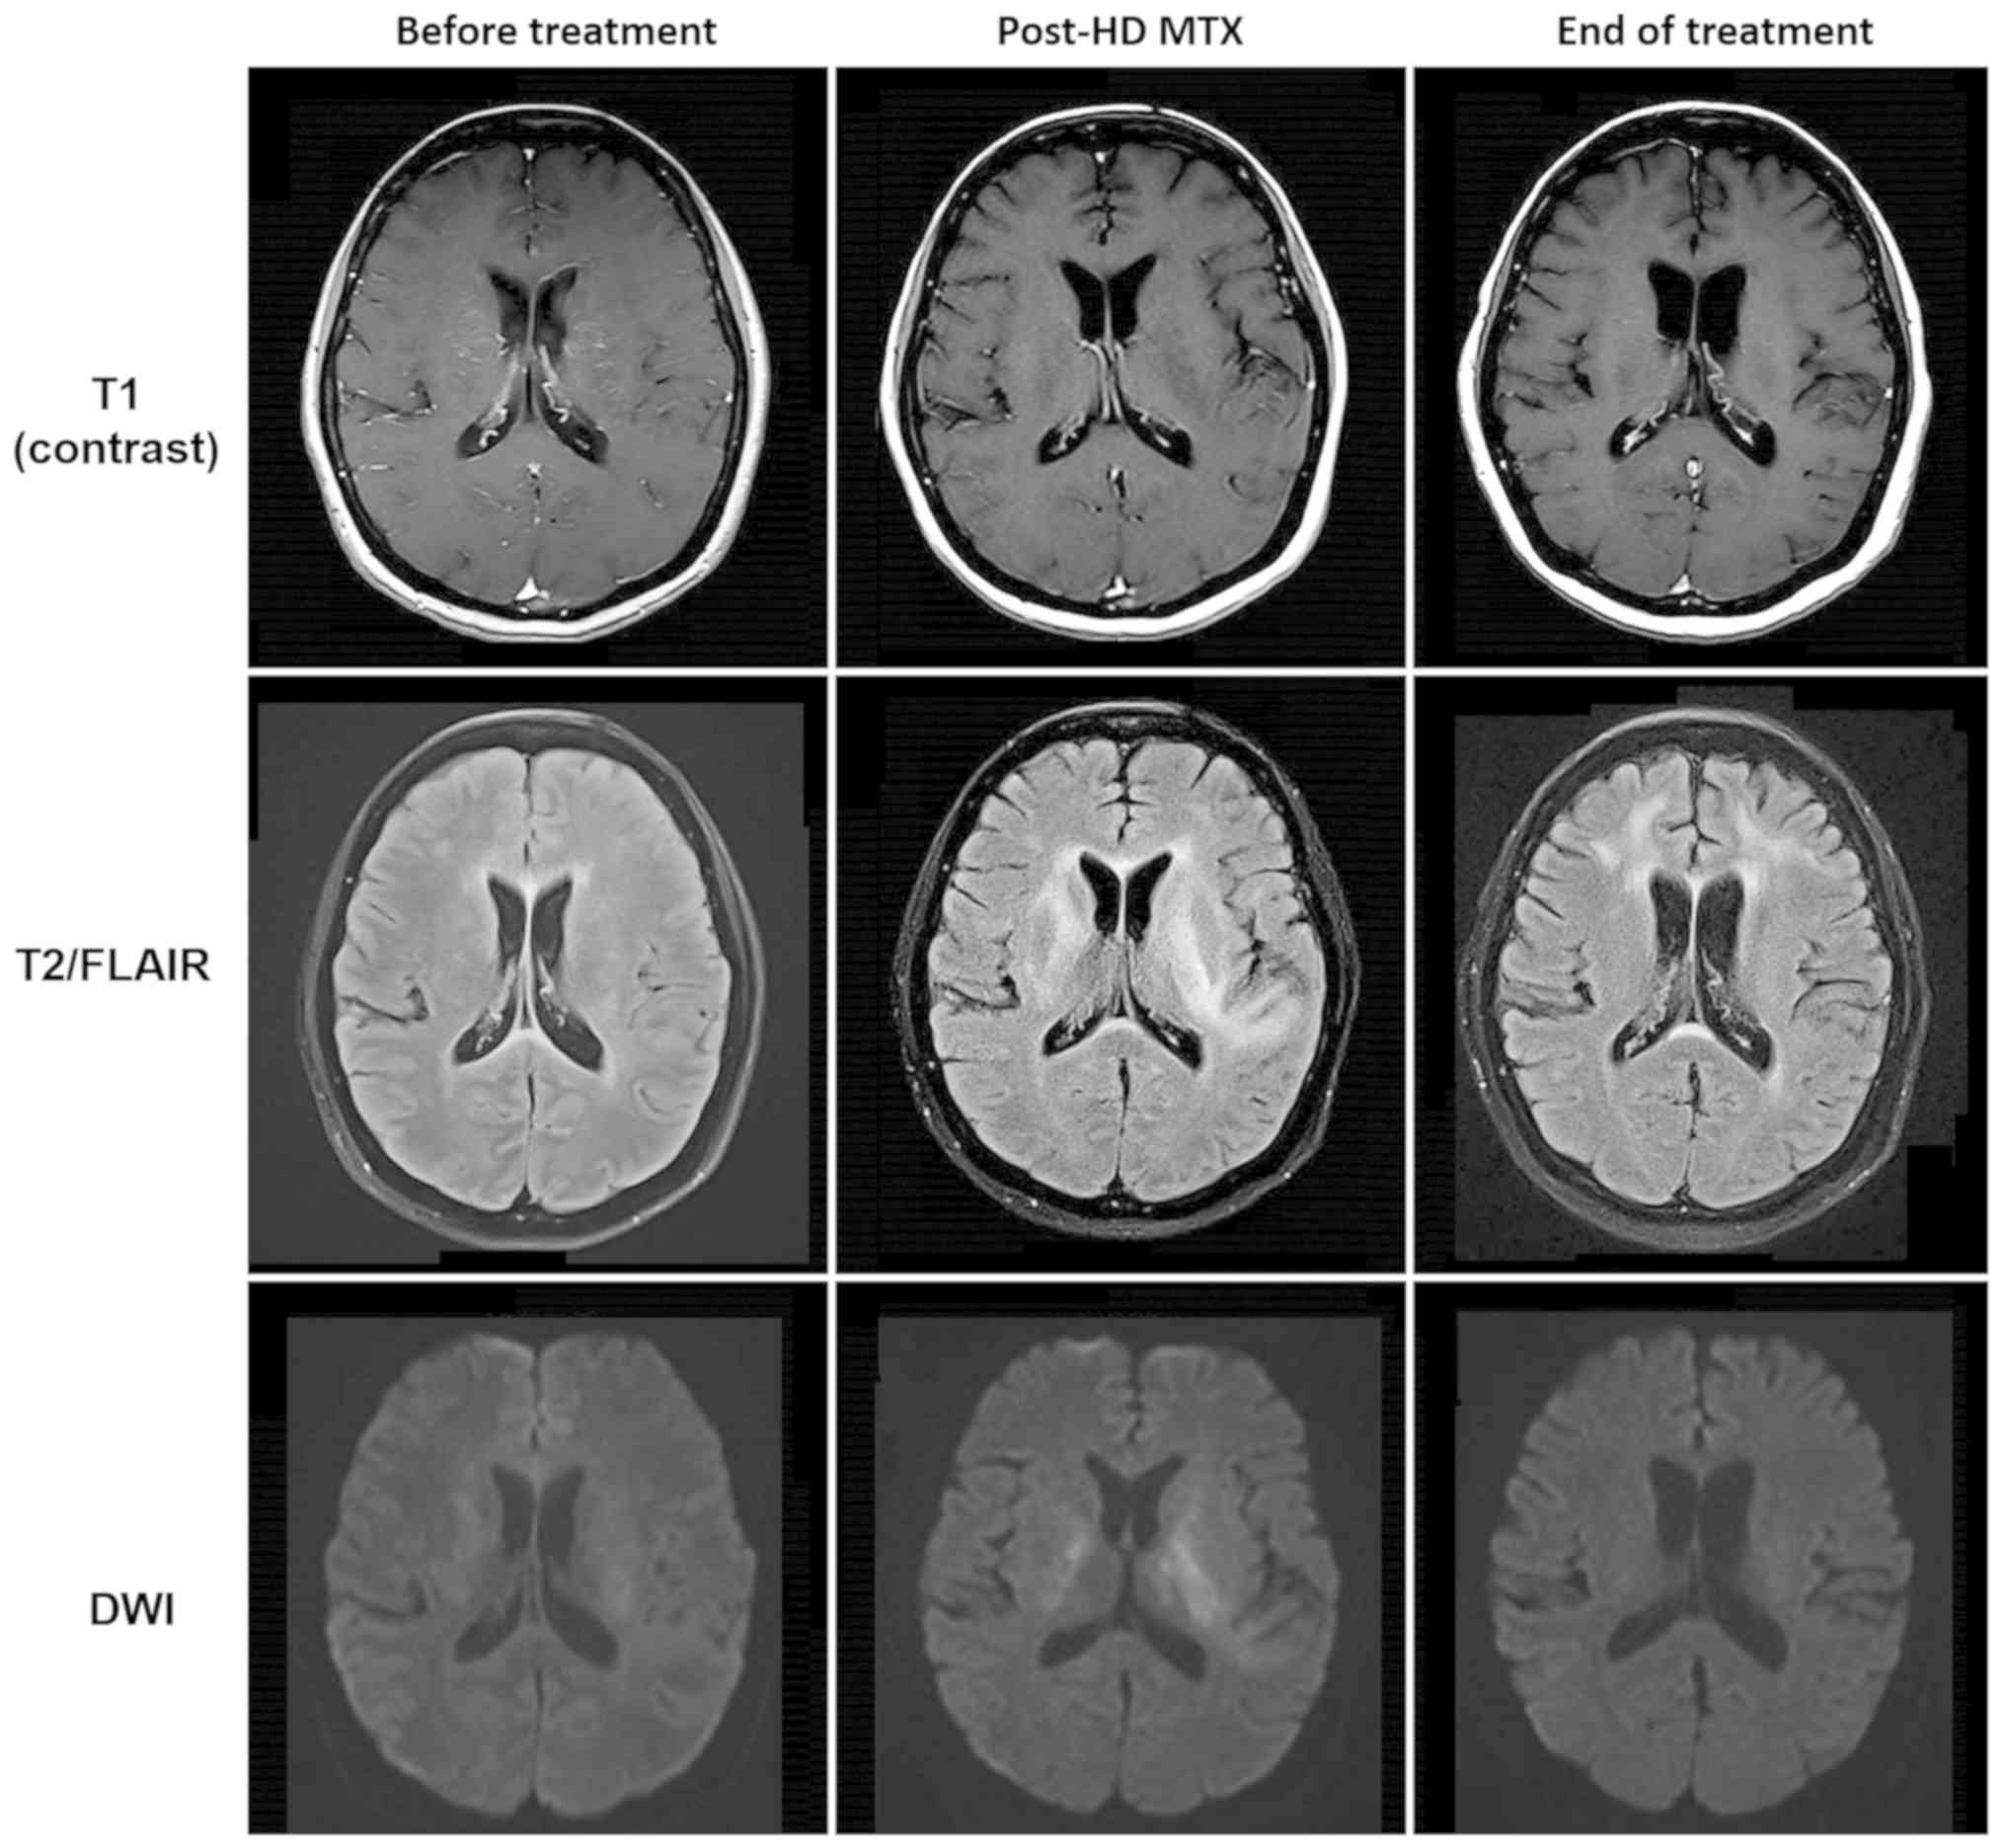 neurontin on drug test